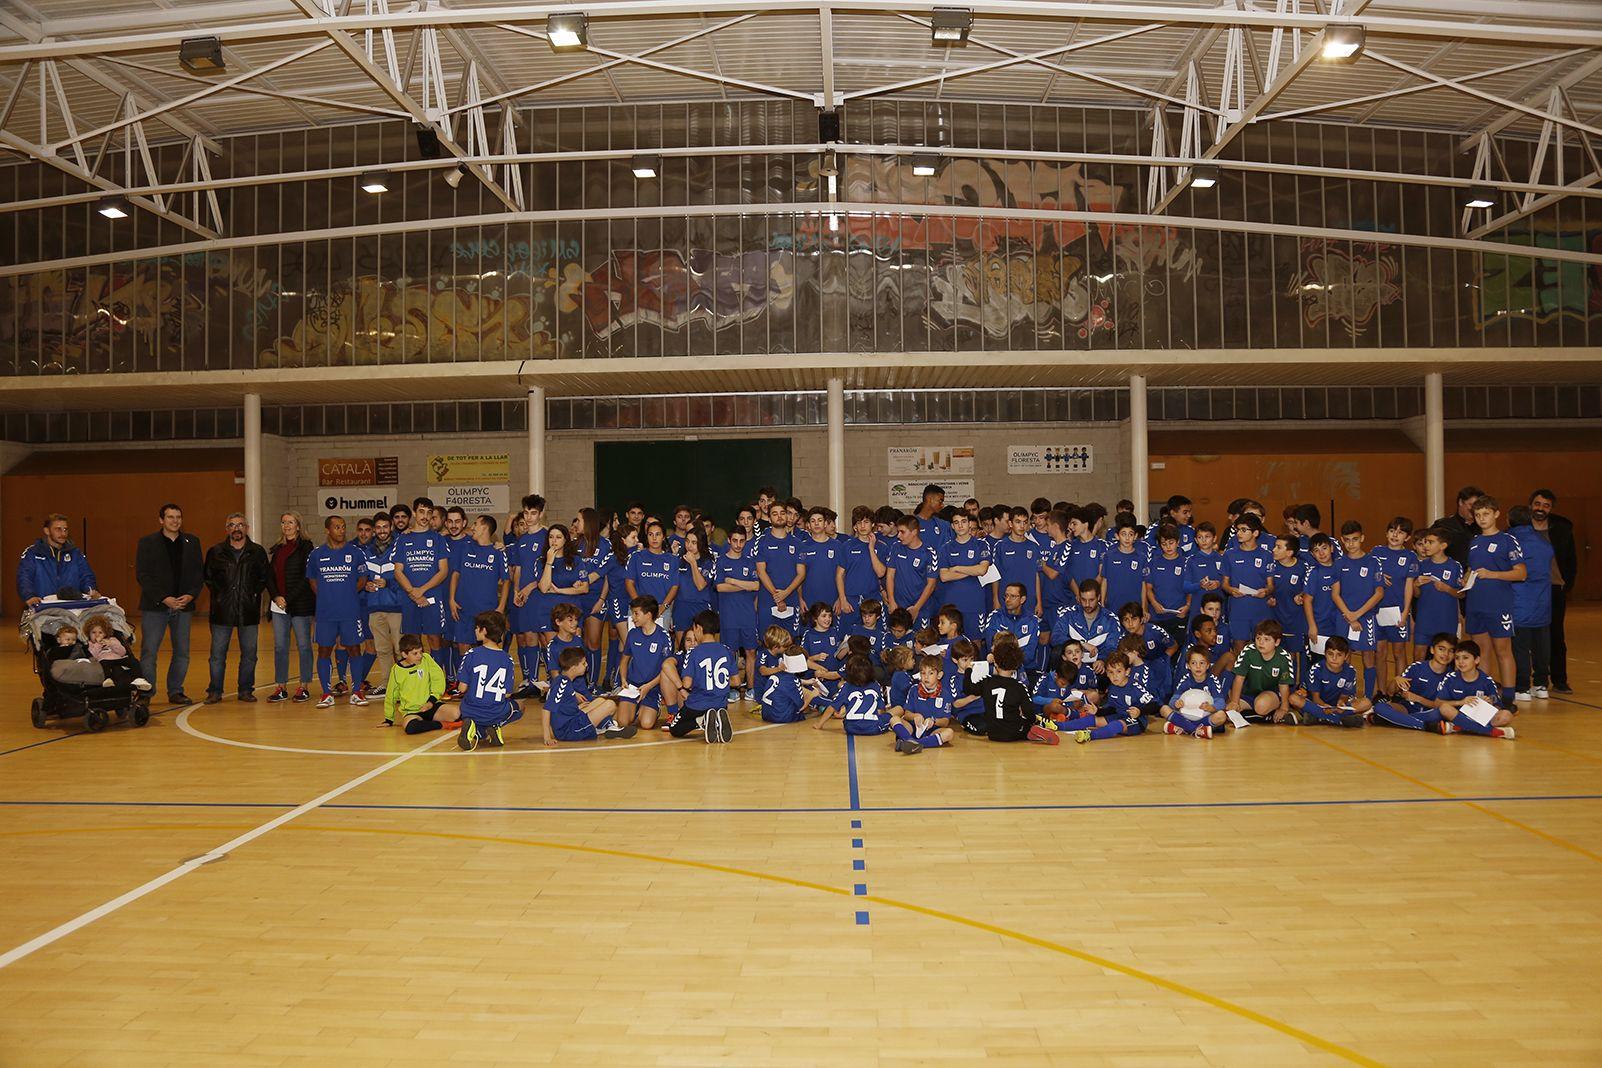 Foto de família de l'Olimpyc la Floresta de futbol sala. FOTO: Anna Bassa